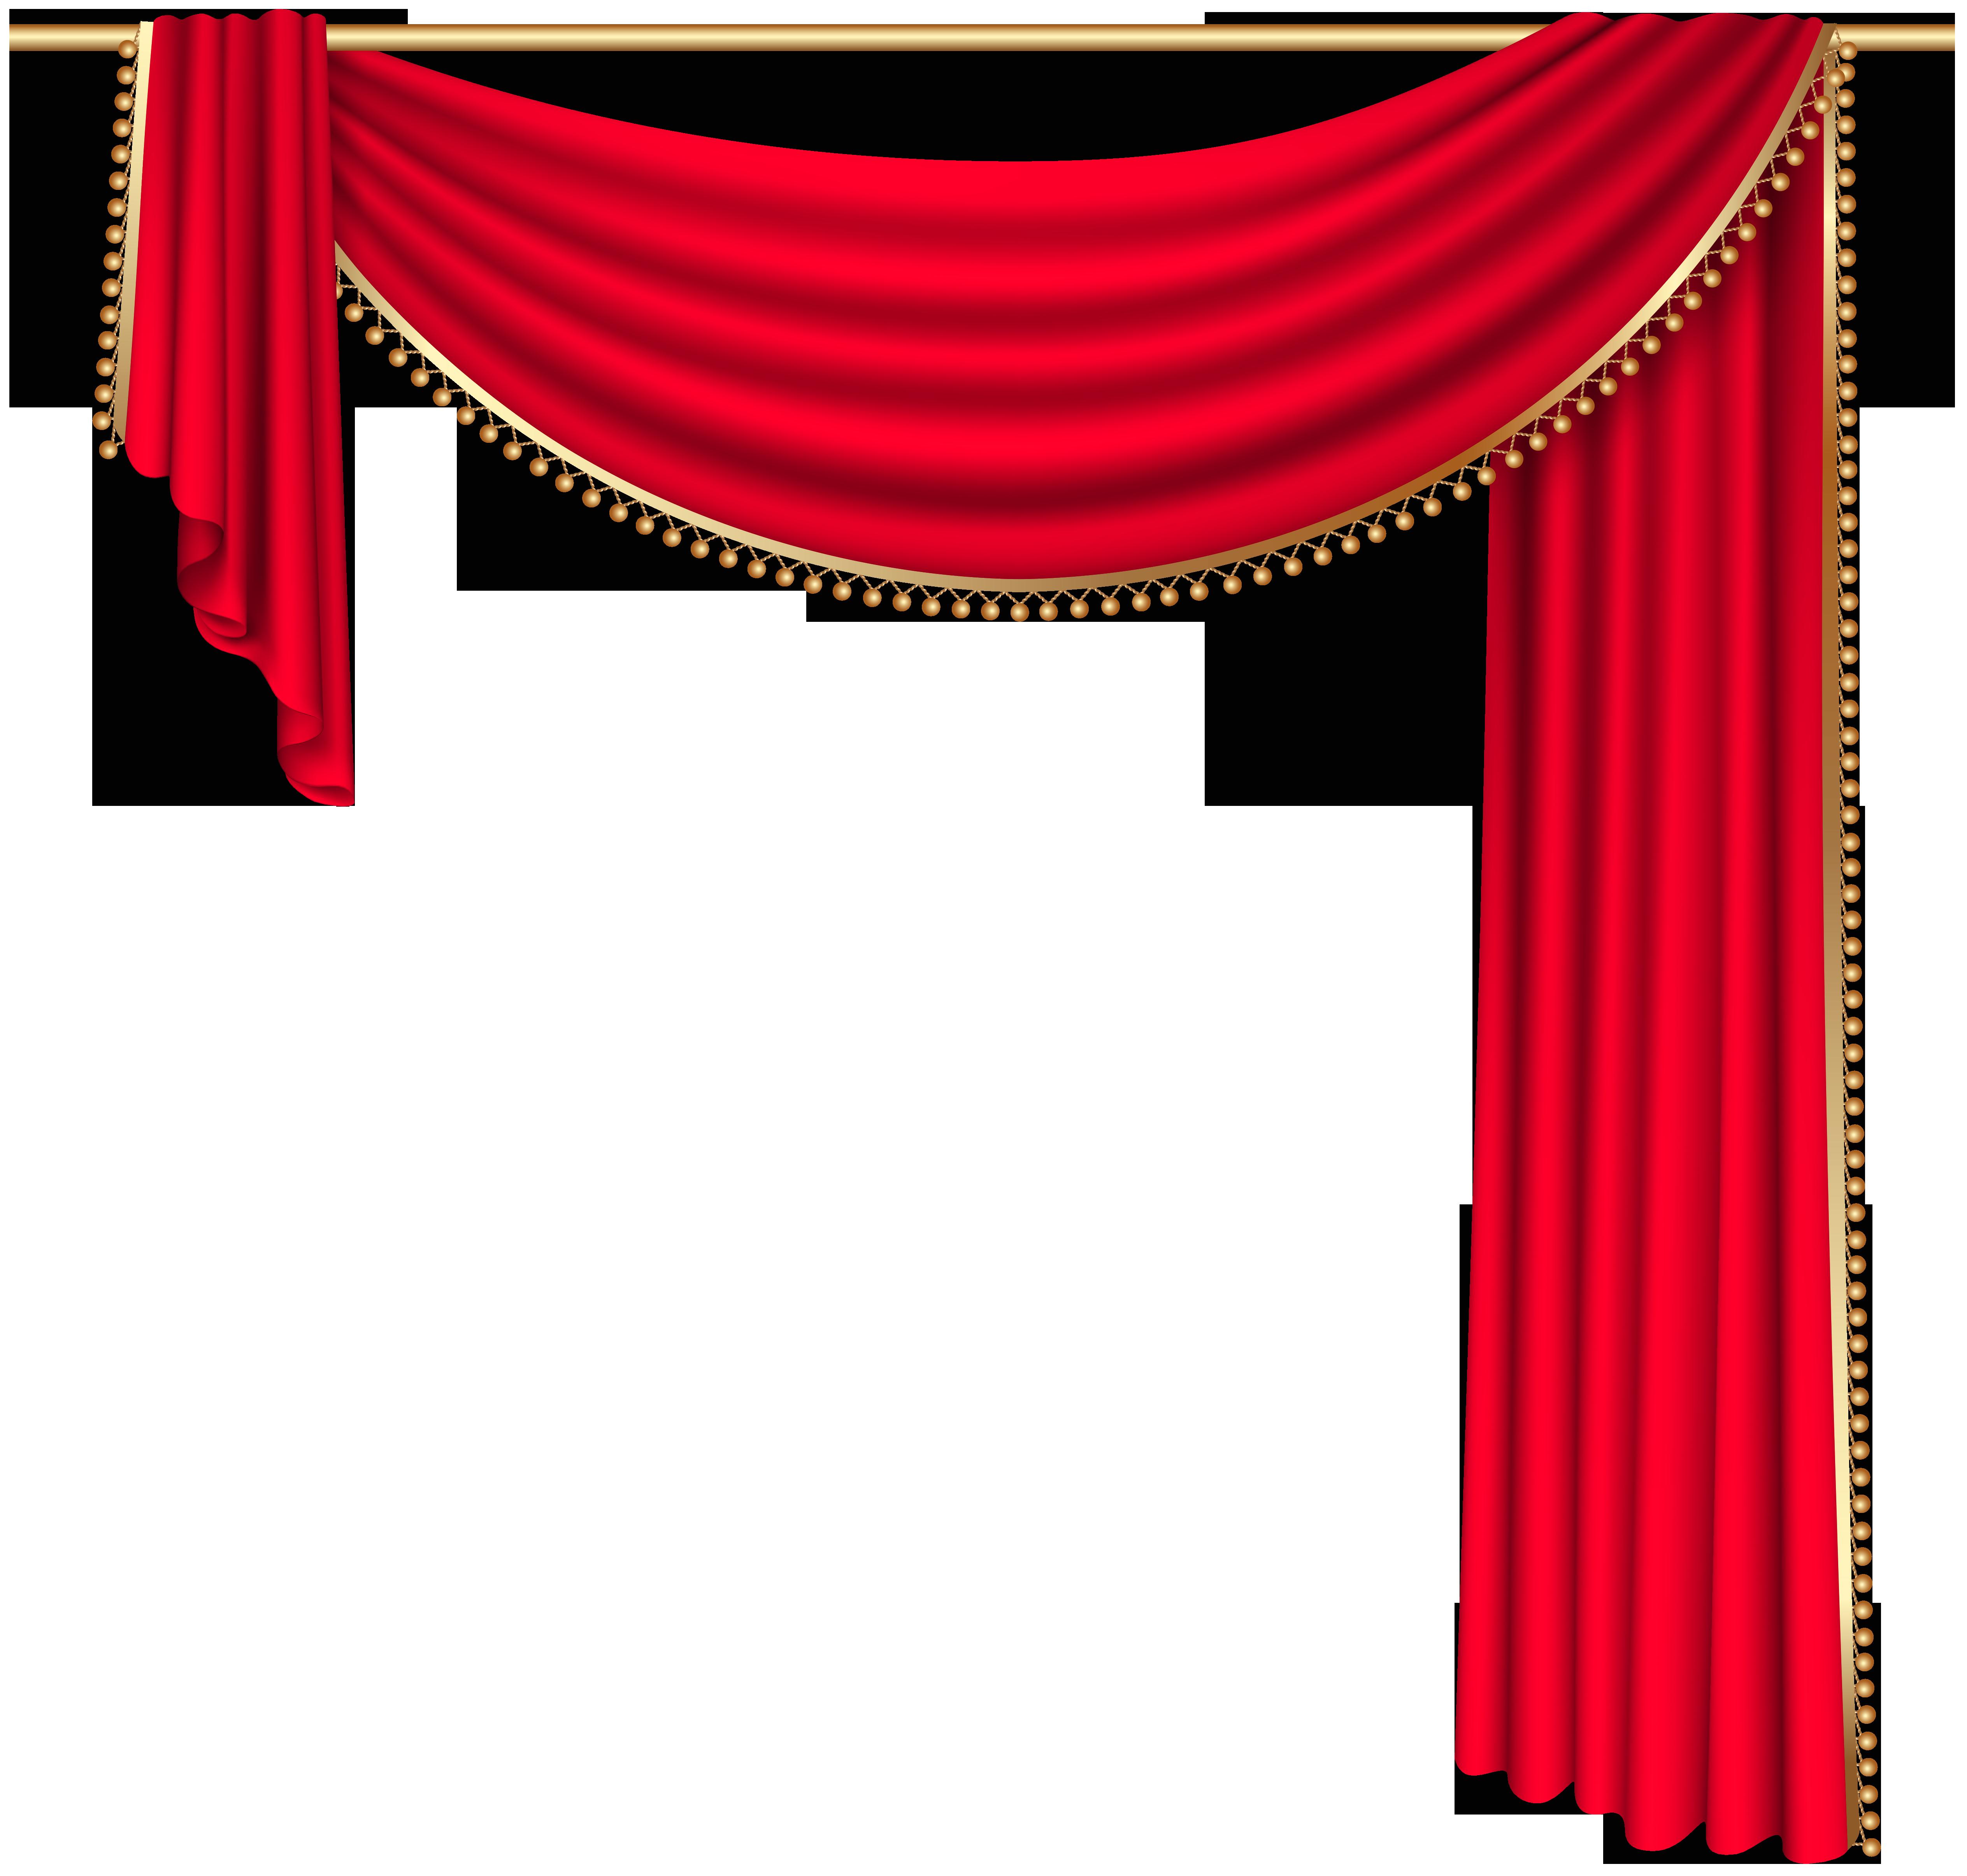 Theatre clipart red curtain Art Art Transparent Clip Mukesh